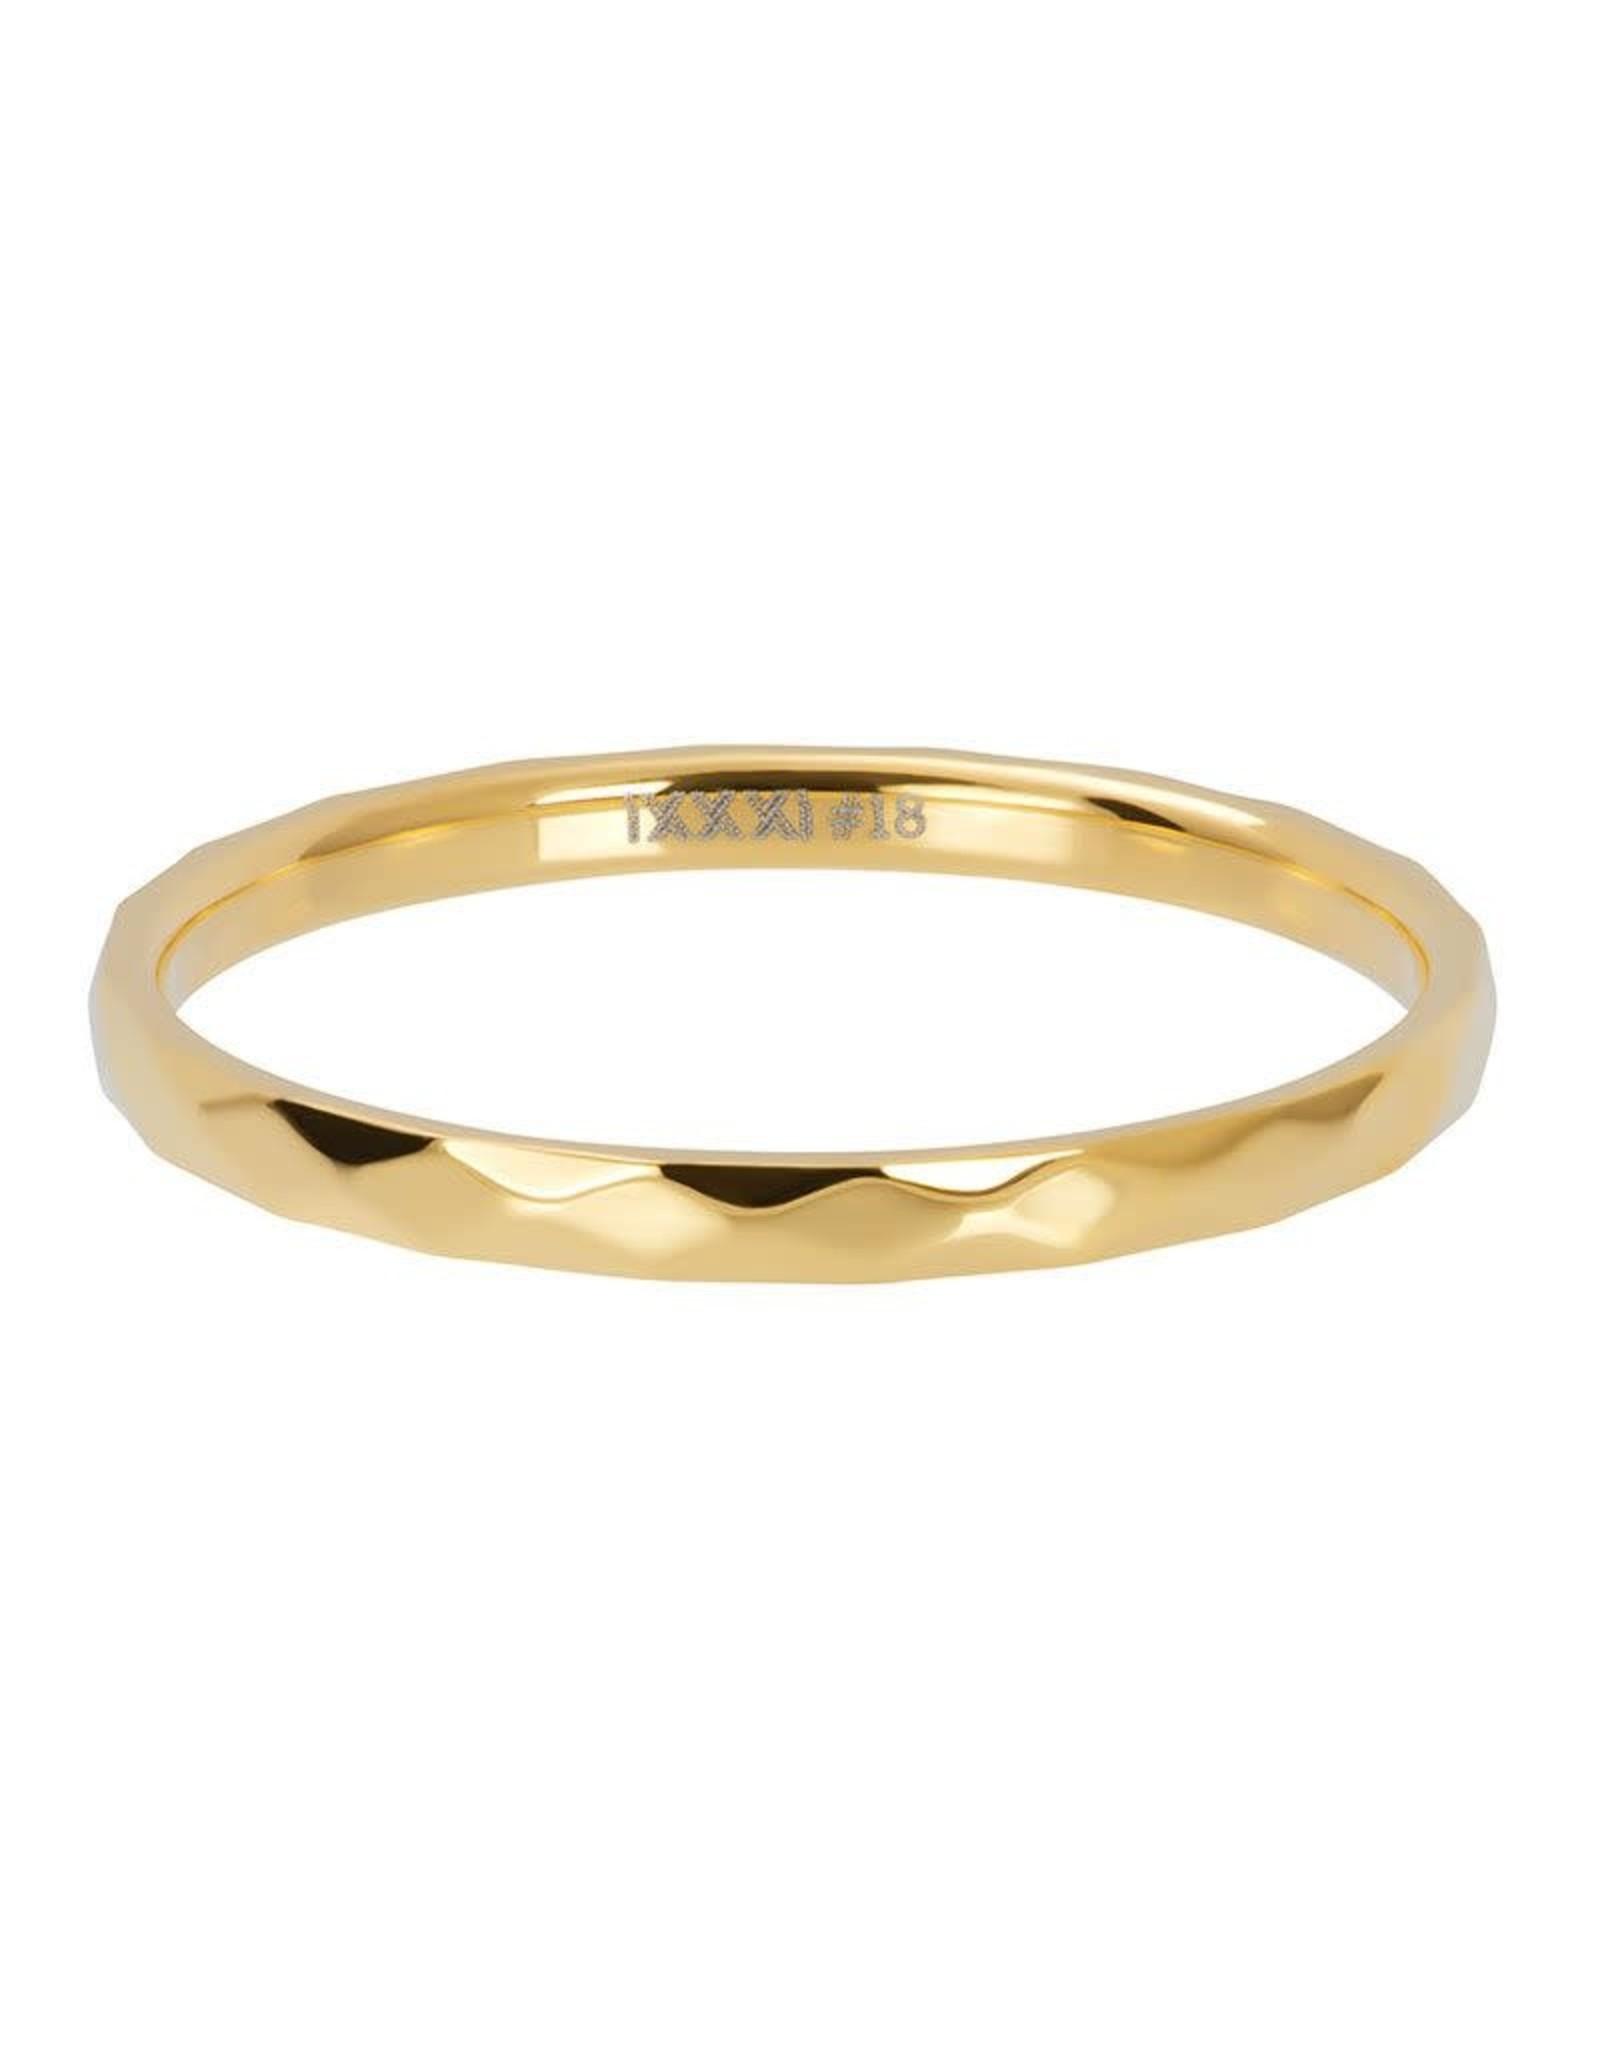 IXXXI IXXXI Hammerite ring Gold